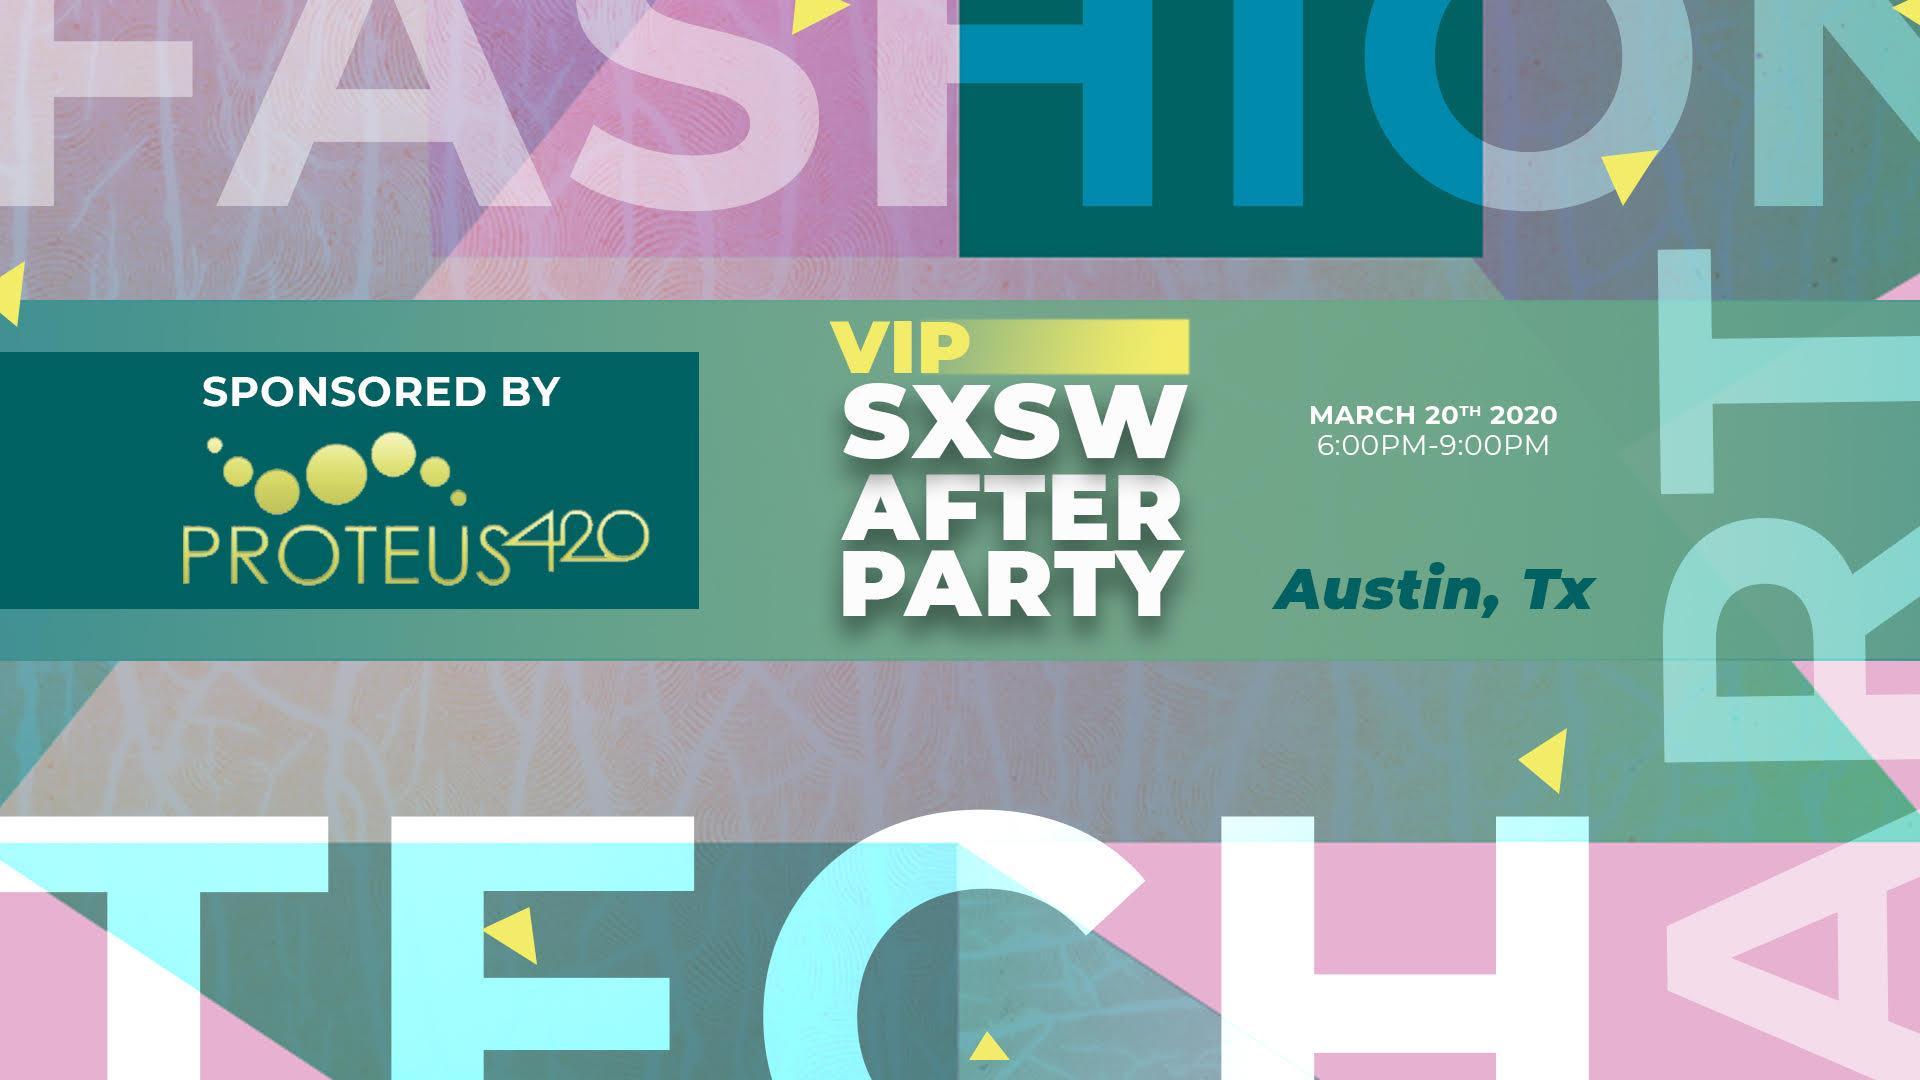 SXSW VIP After Party + Workshop